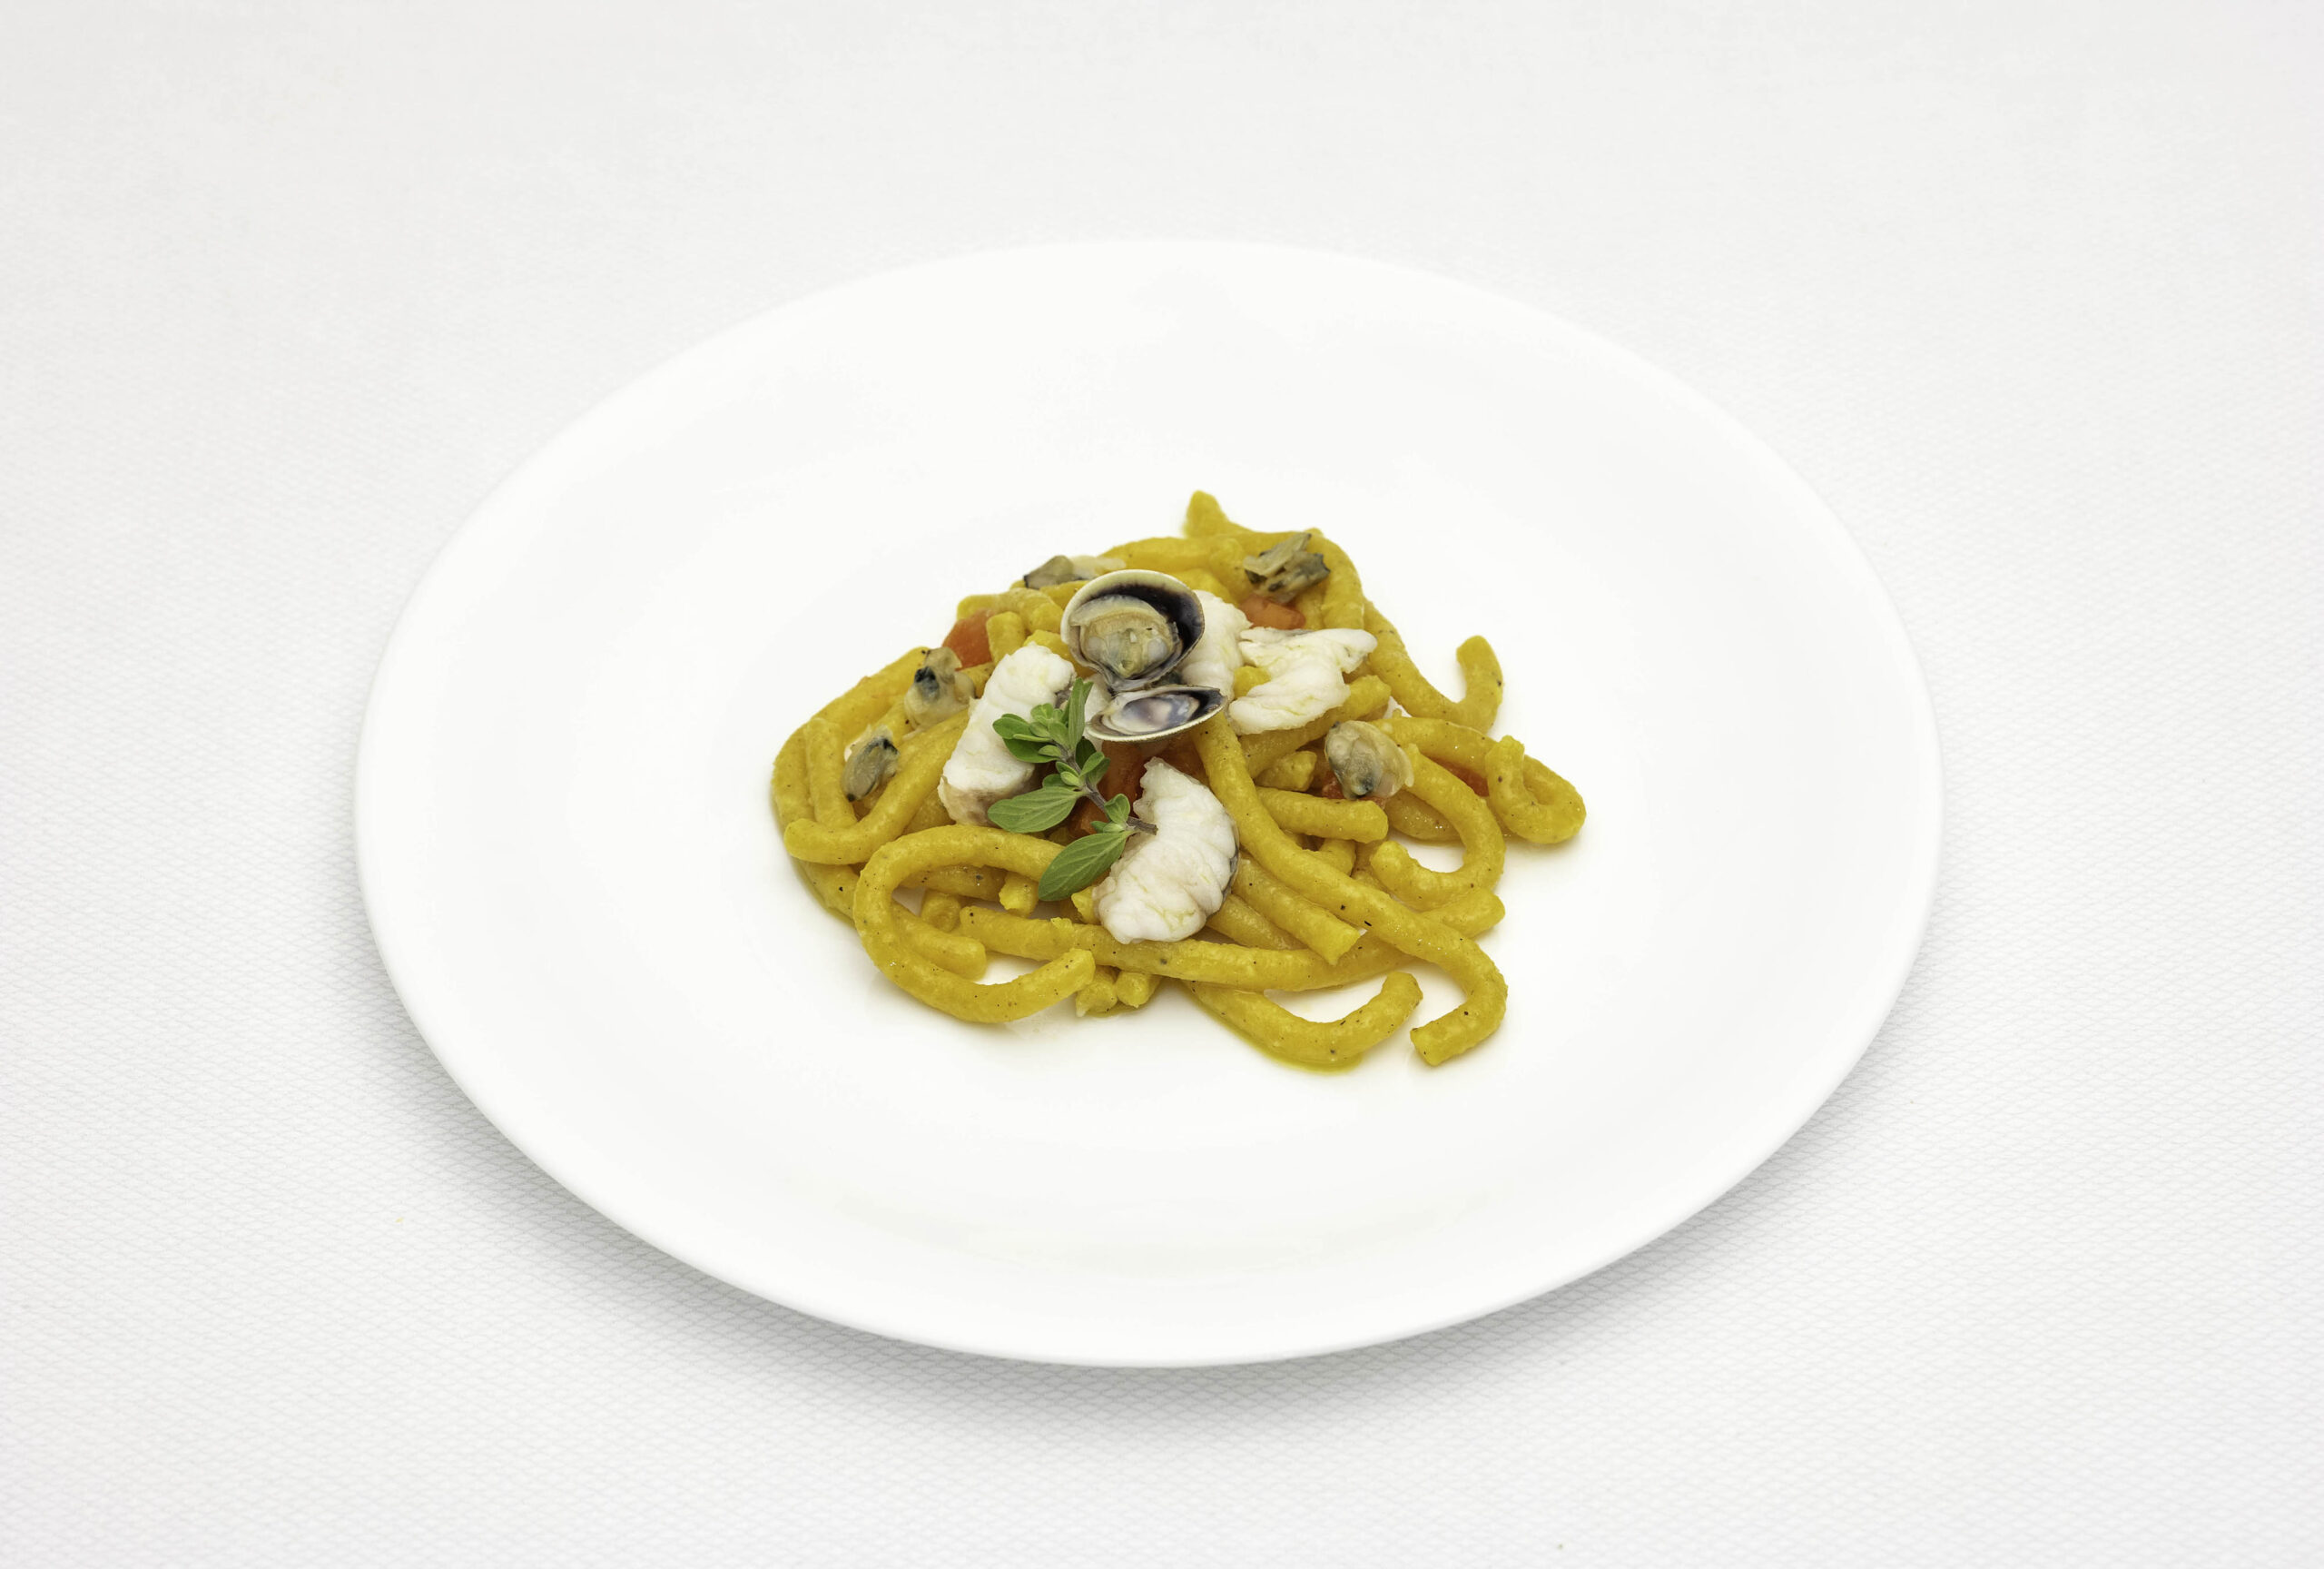 Pastifico-La-Fenice-pastificio-Cesenatico-pasta-fresca-pasta-surgelata-pasta-artigianale-Emilia-Romagna-passatelli-rana-pescatrice-vongole